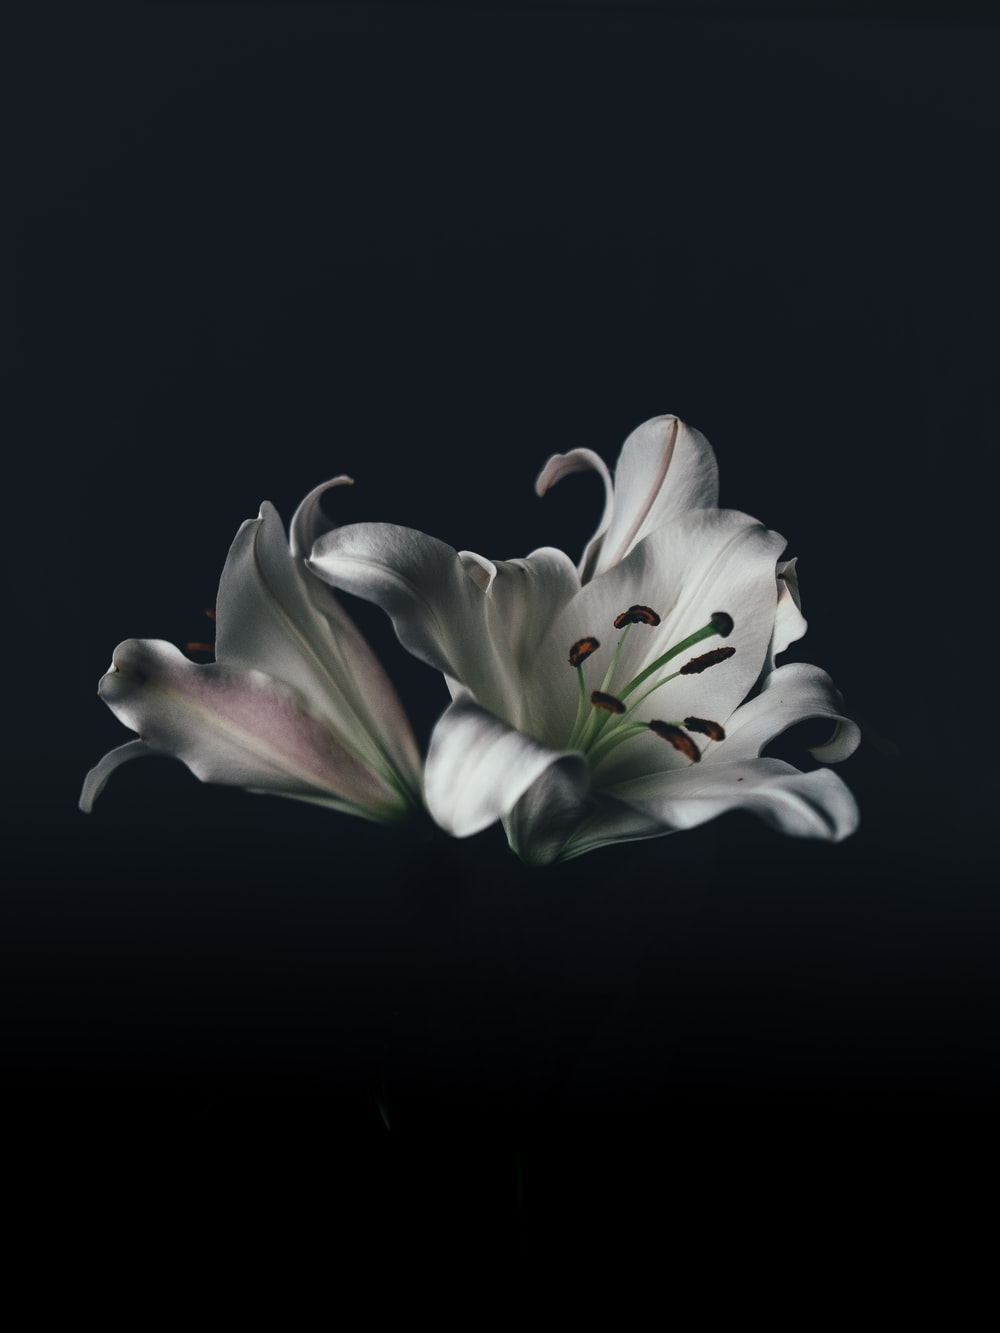 White flowers dark background photo by yousef alfuhigi two white lily flowers against a black background mightylinksfo